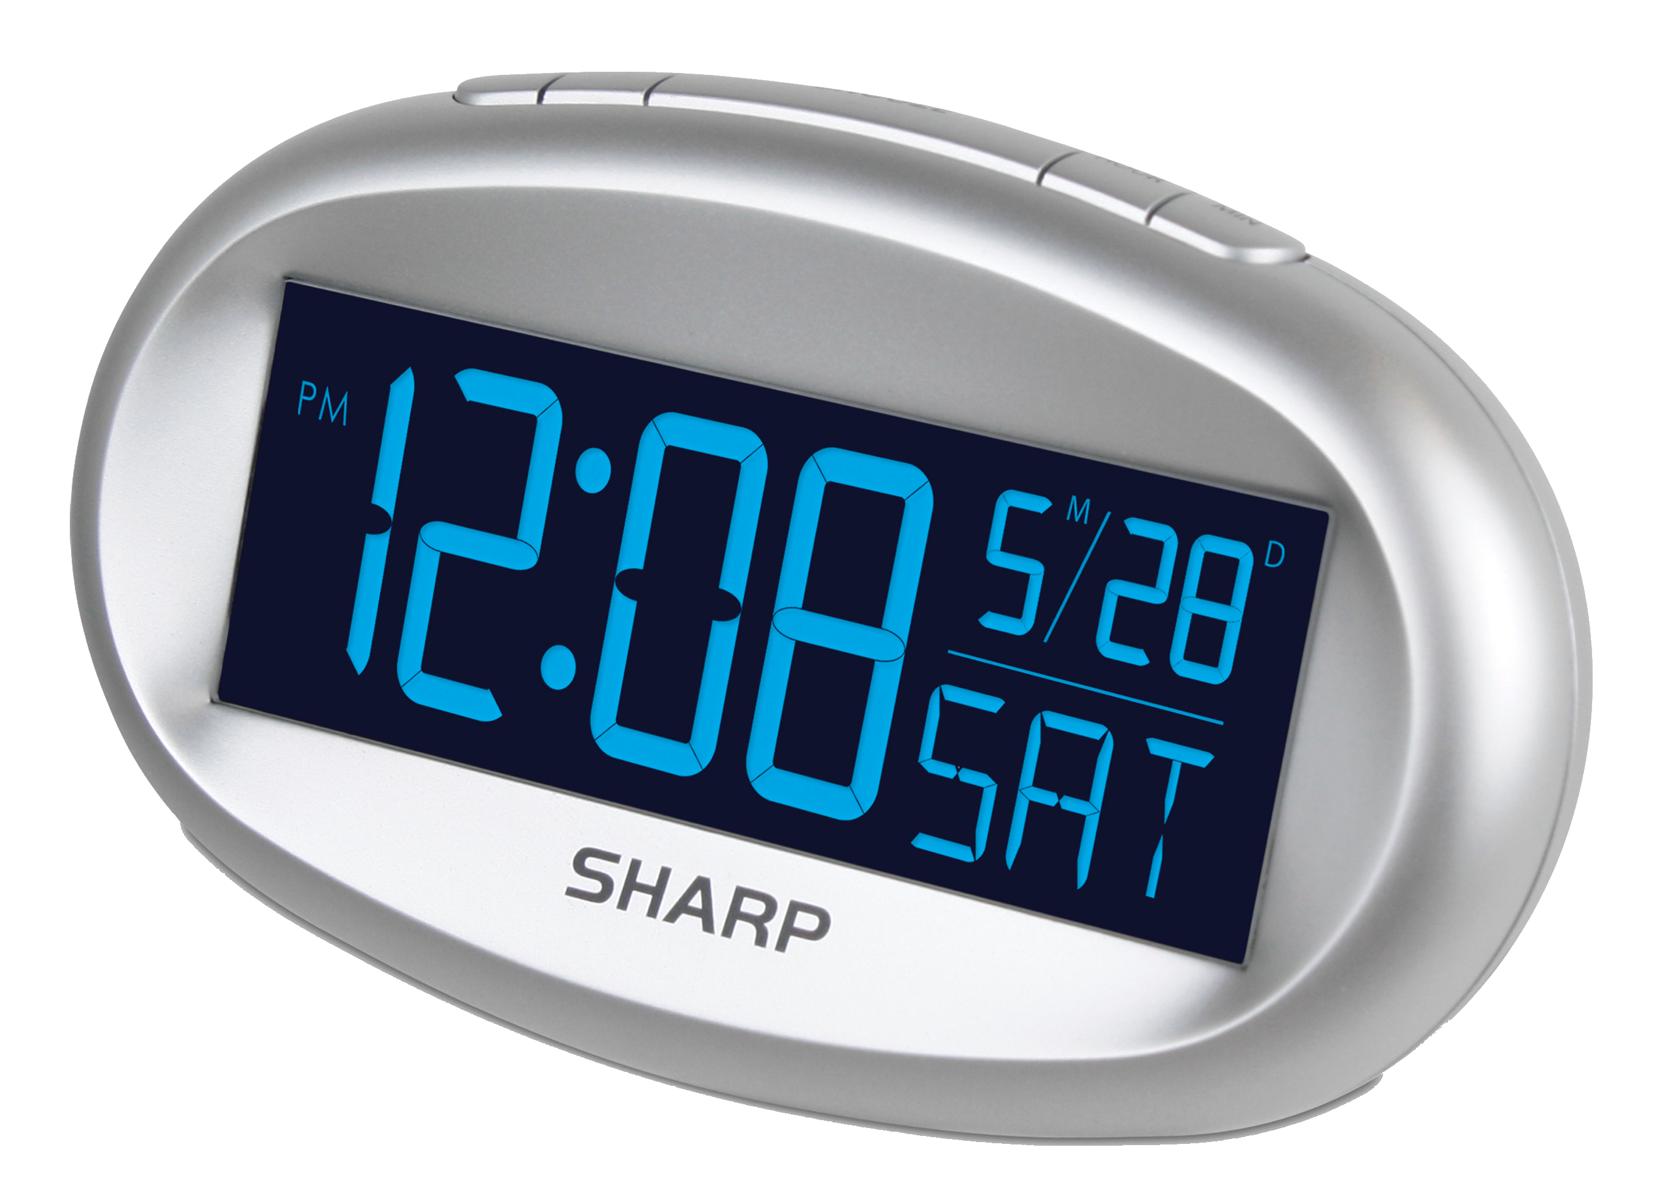 Digital Alarm Clock Png Image Alarm Clock Digital Alarm Clock Digital Clocks